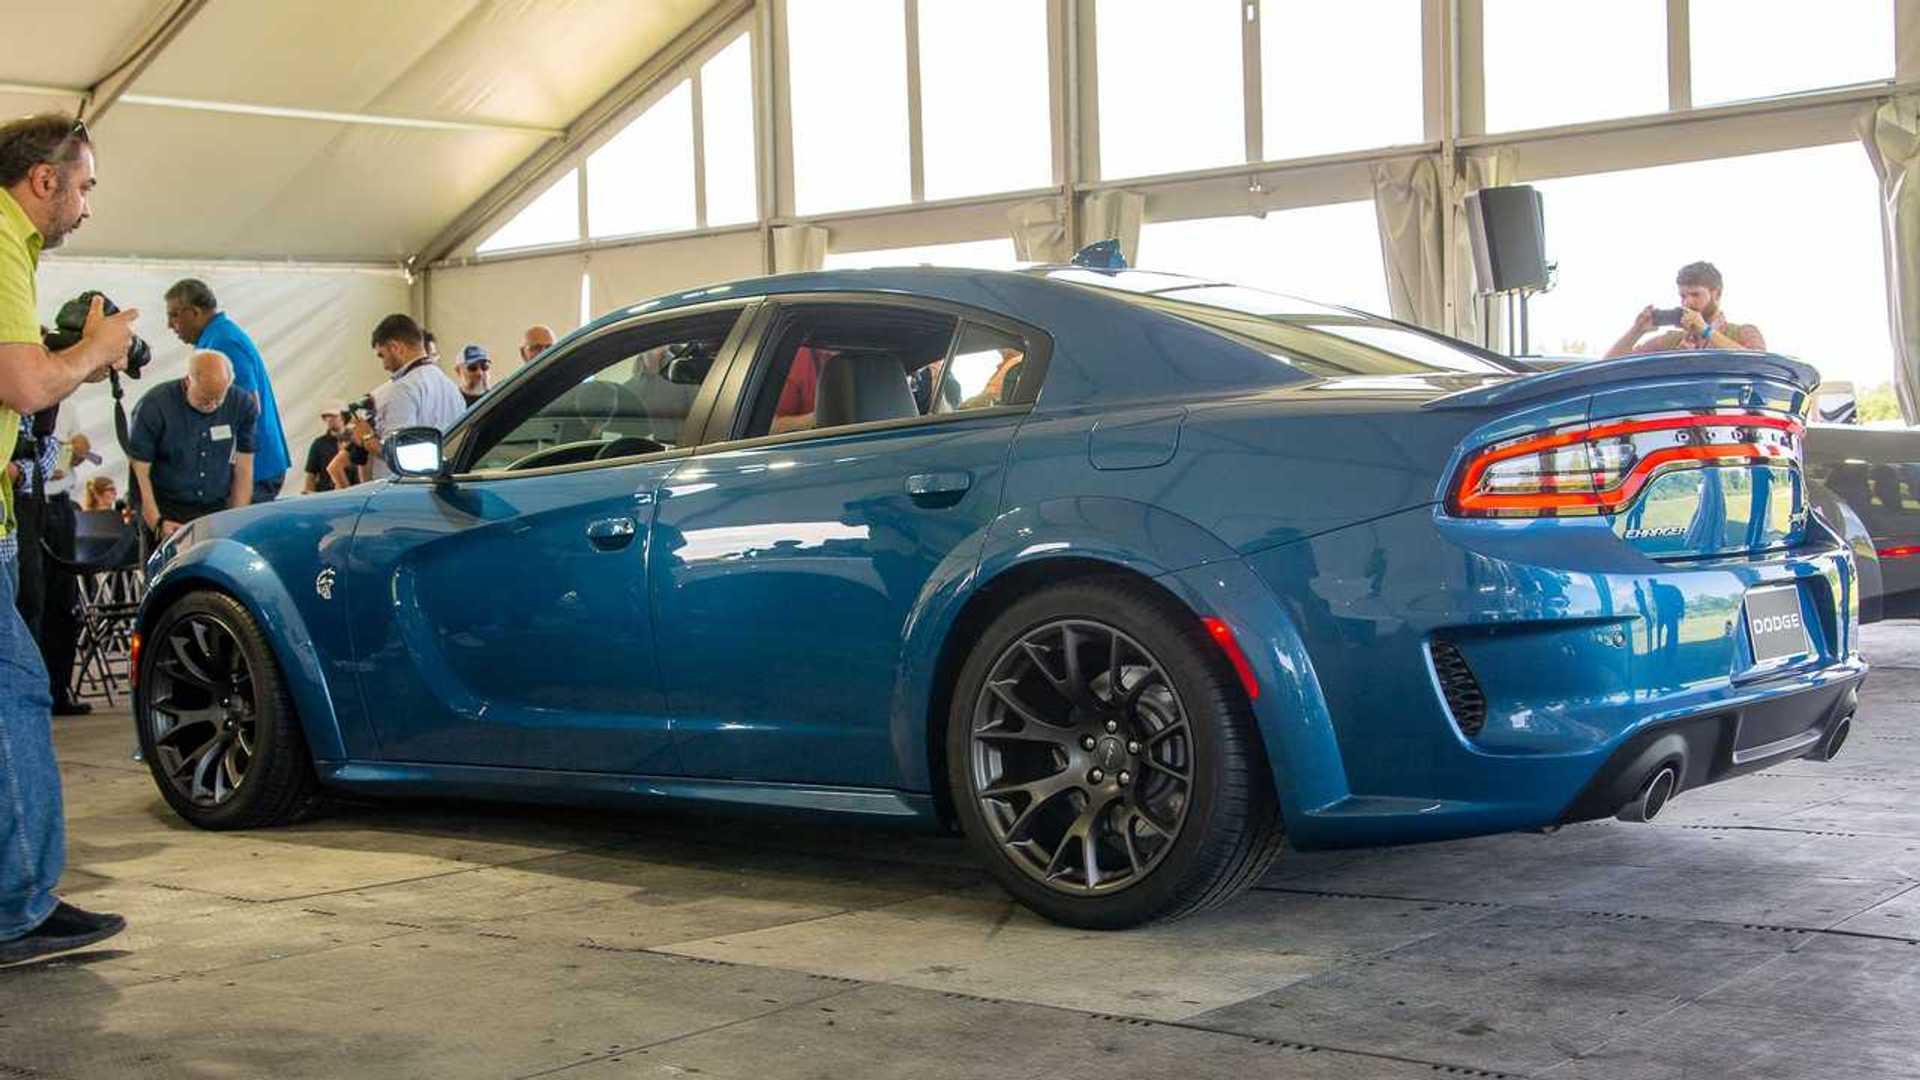 2020 Dodge Charger Srt Hellcat Widebody Starts At 71 140